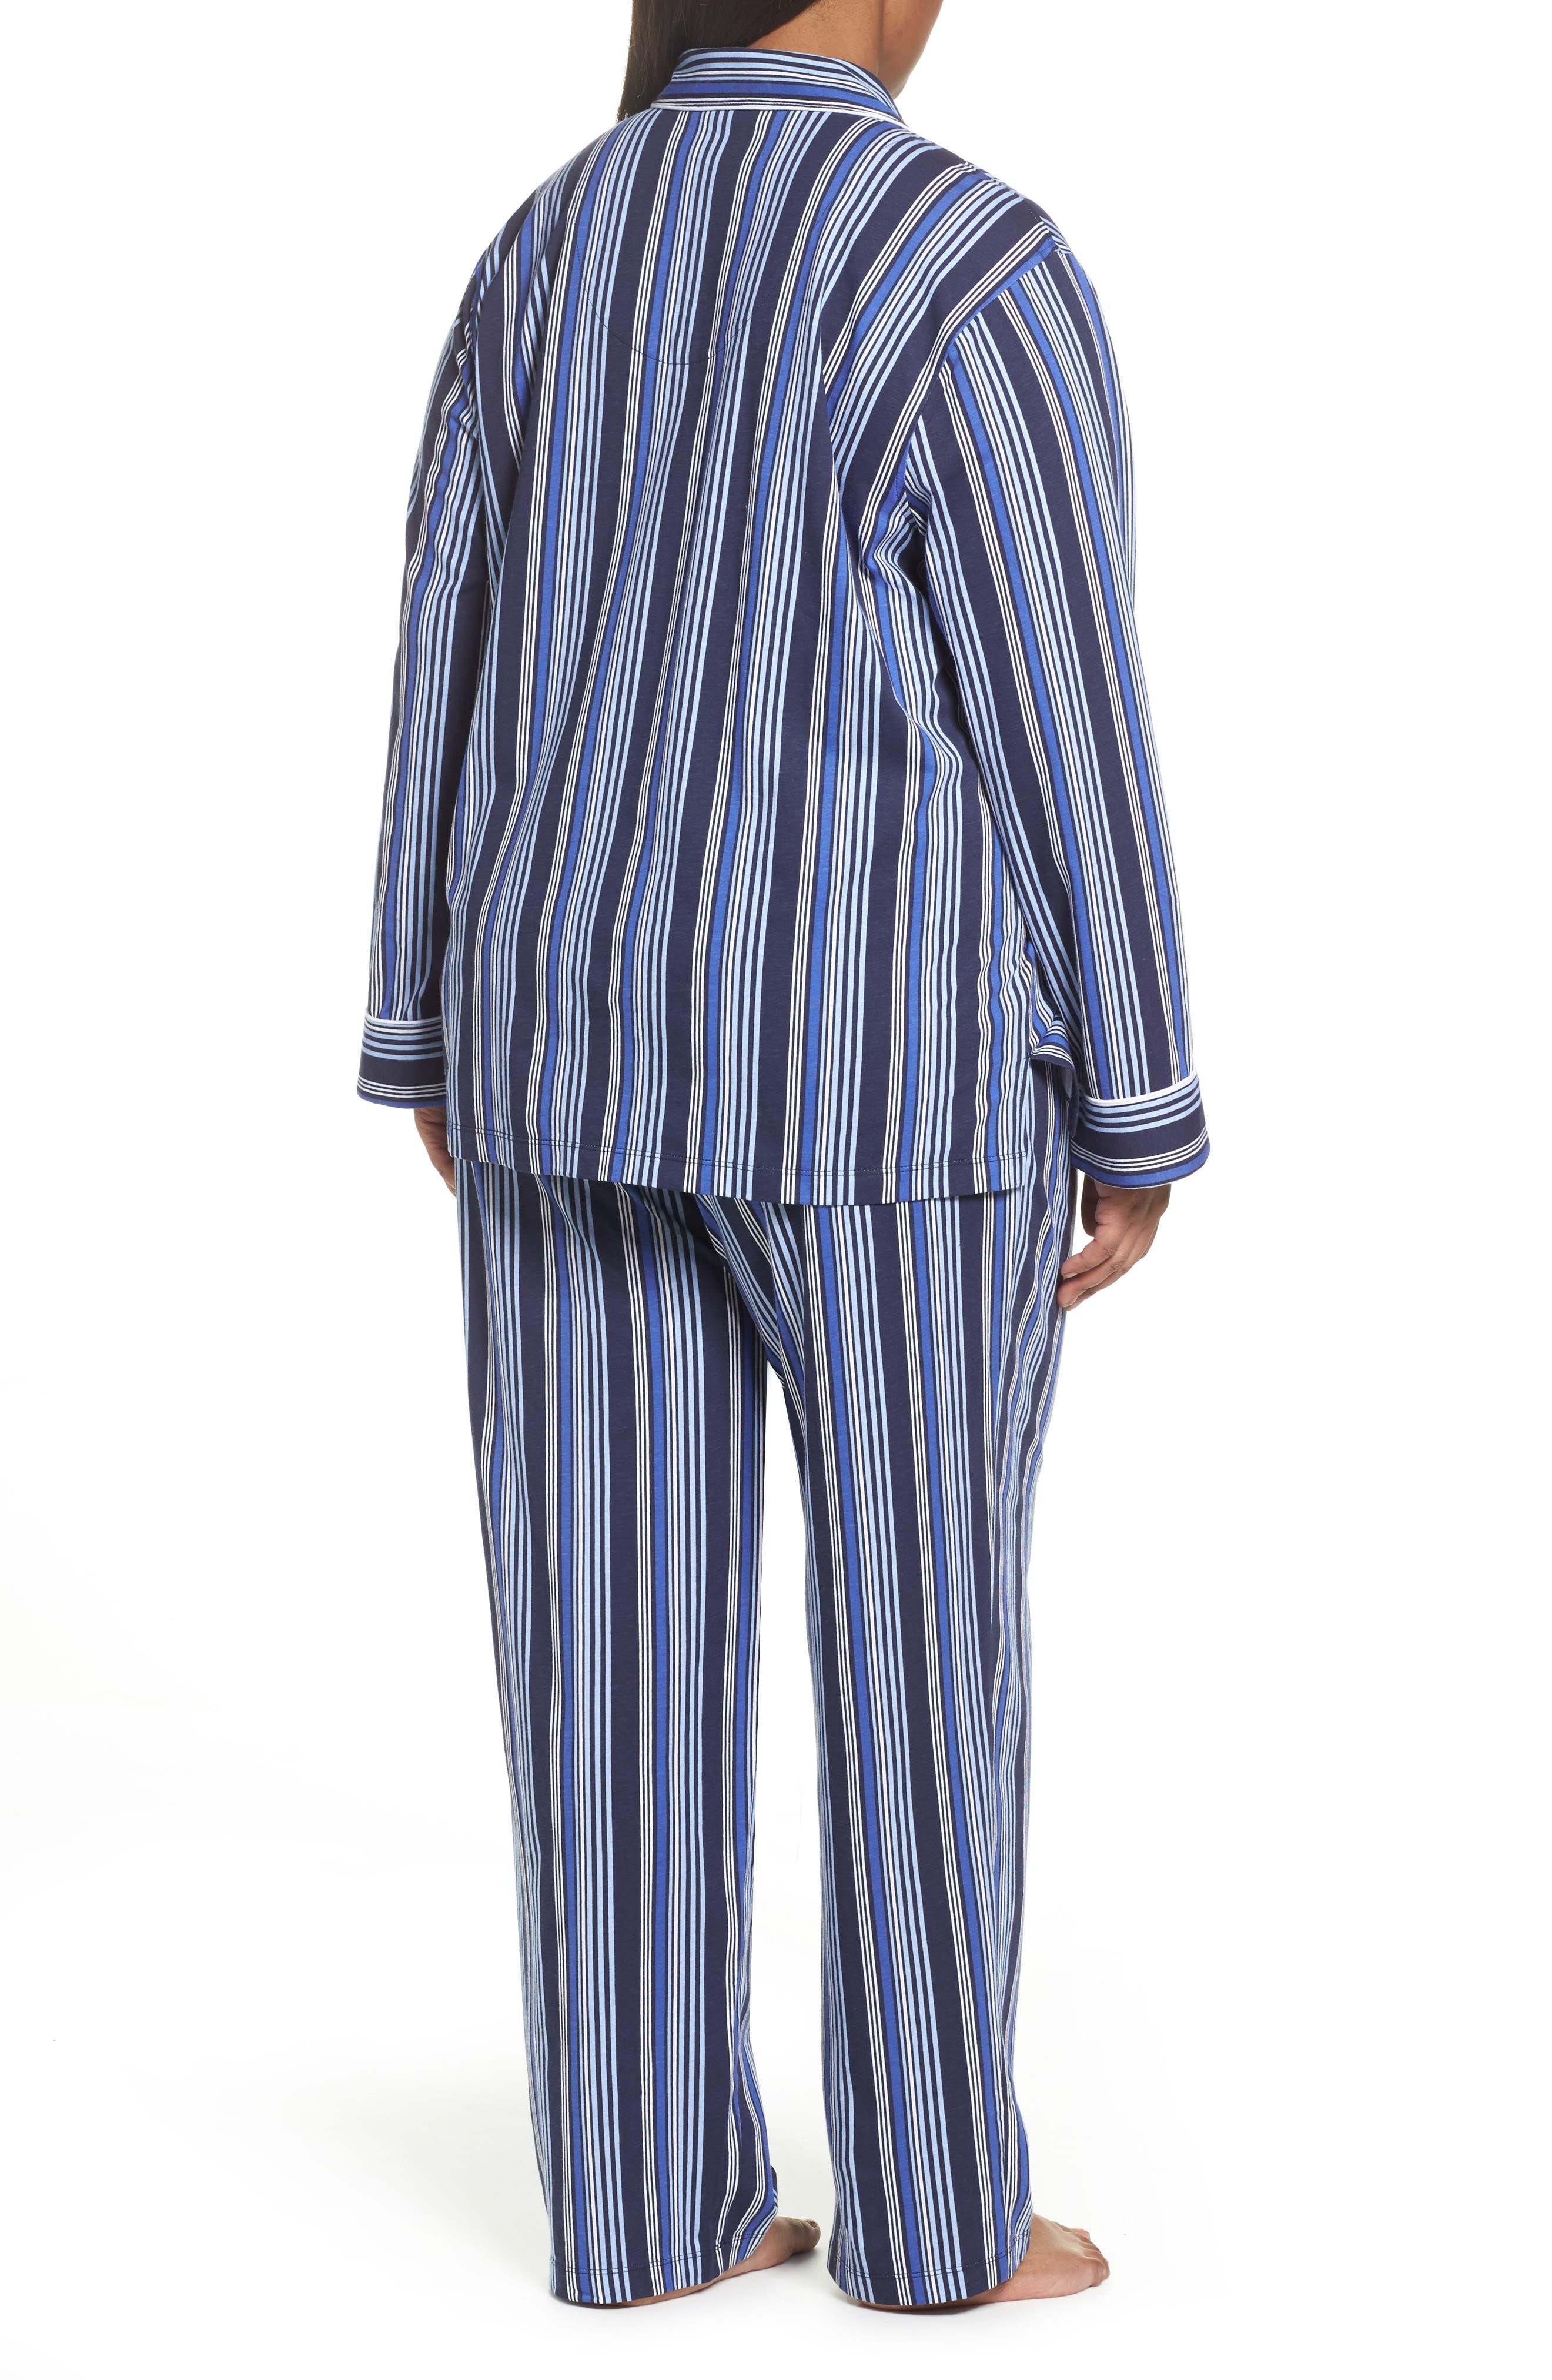 Stripe Pajamas,                             Alternate thumbnail 2, color,                             486